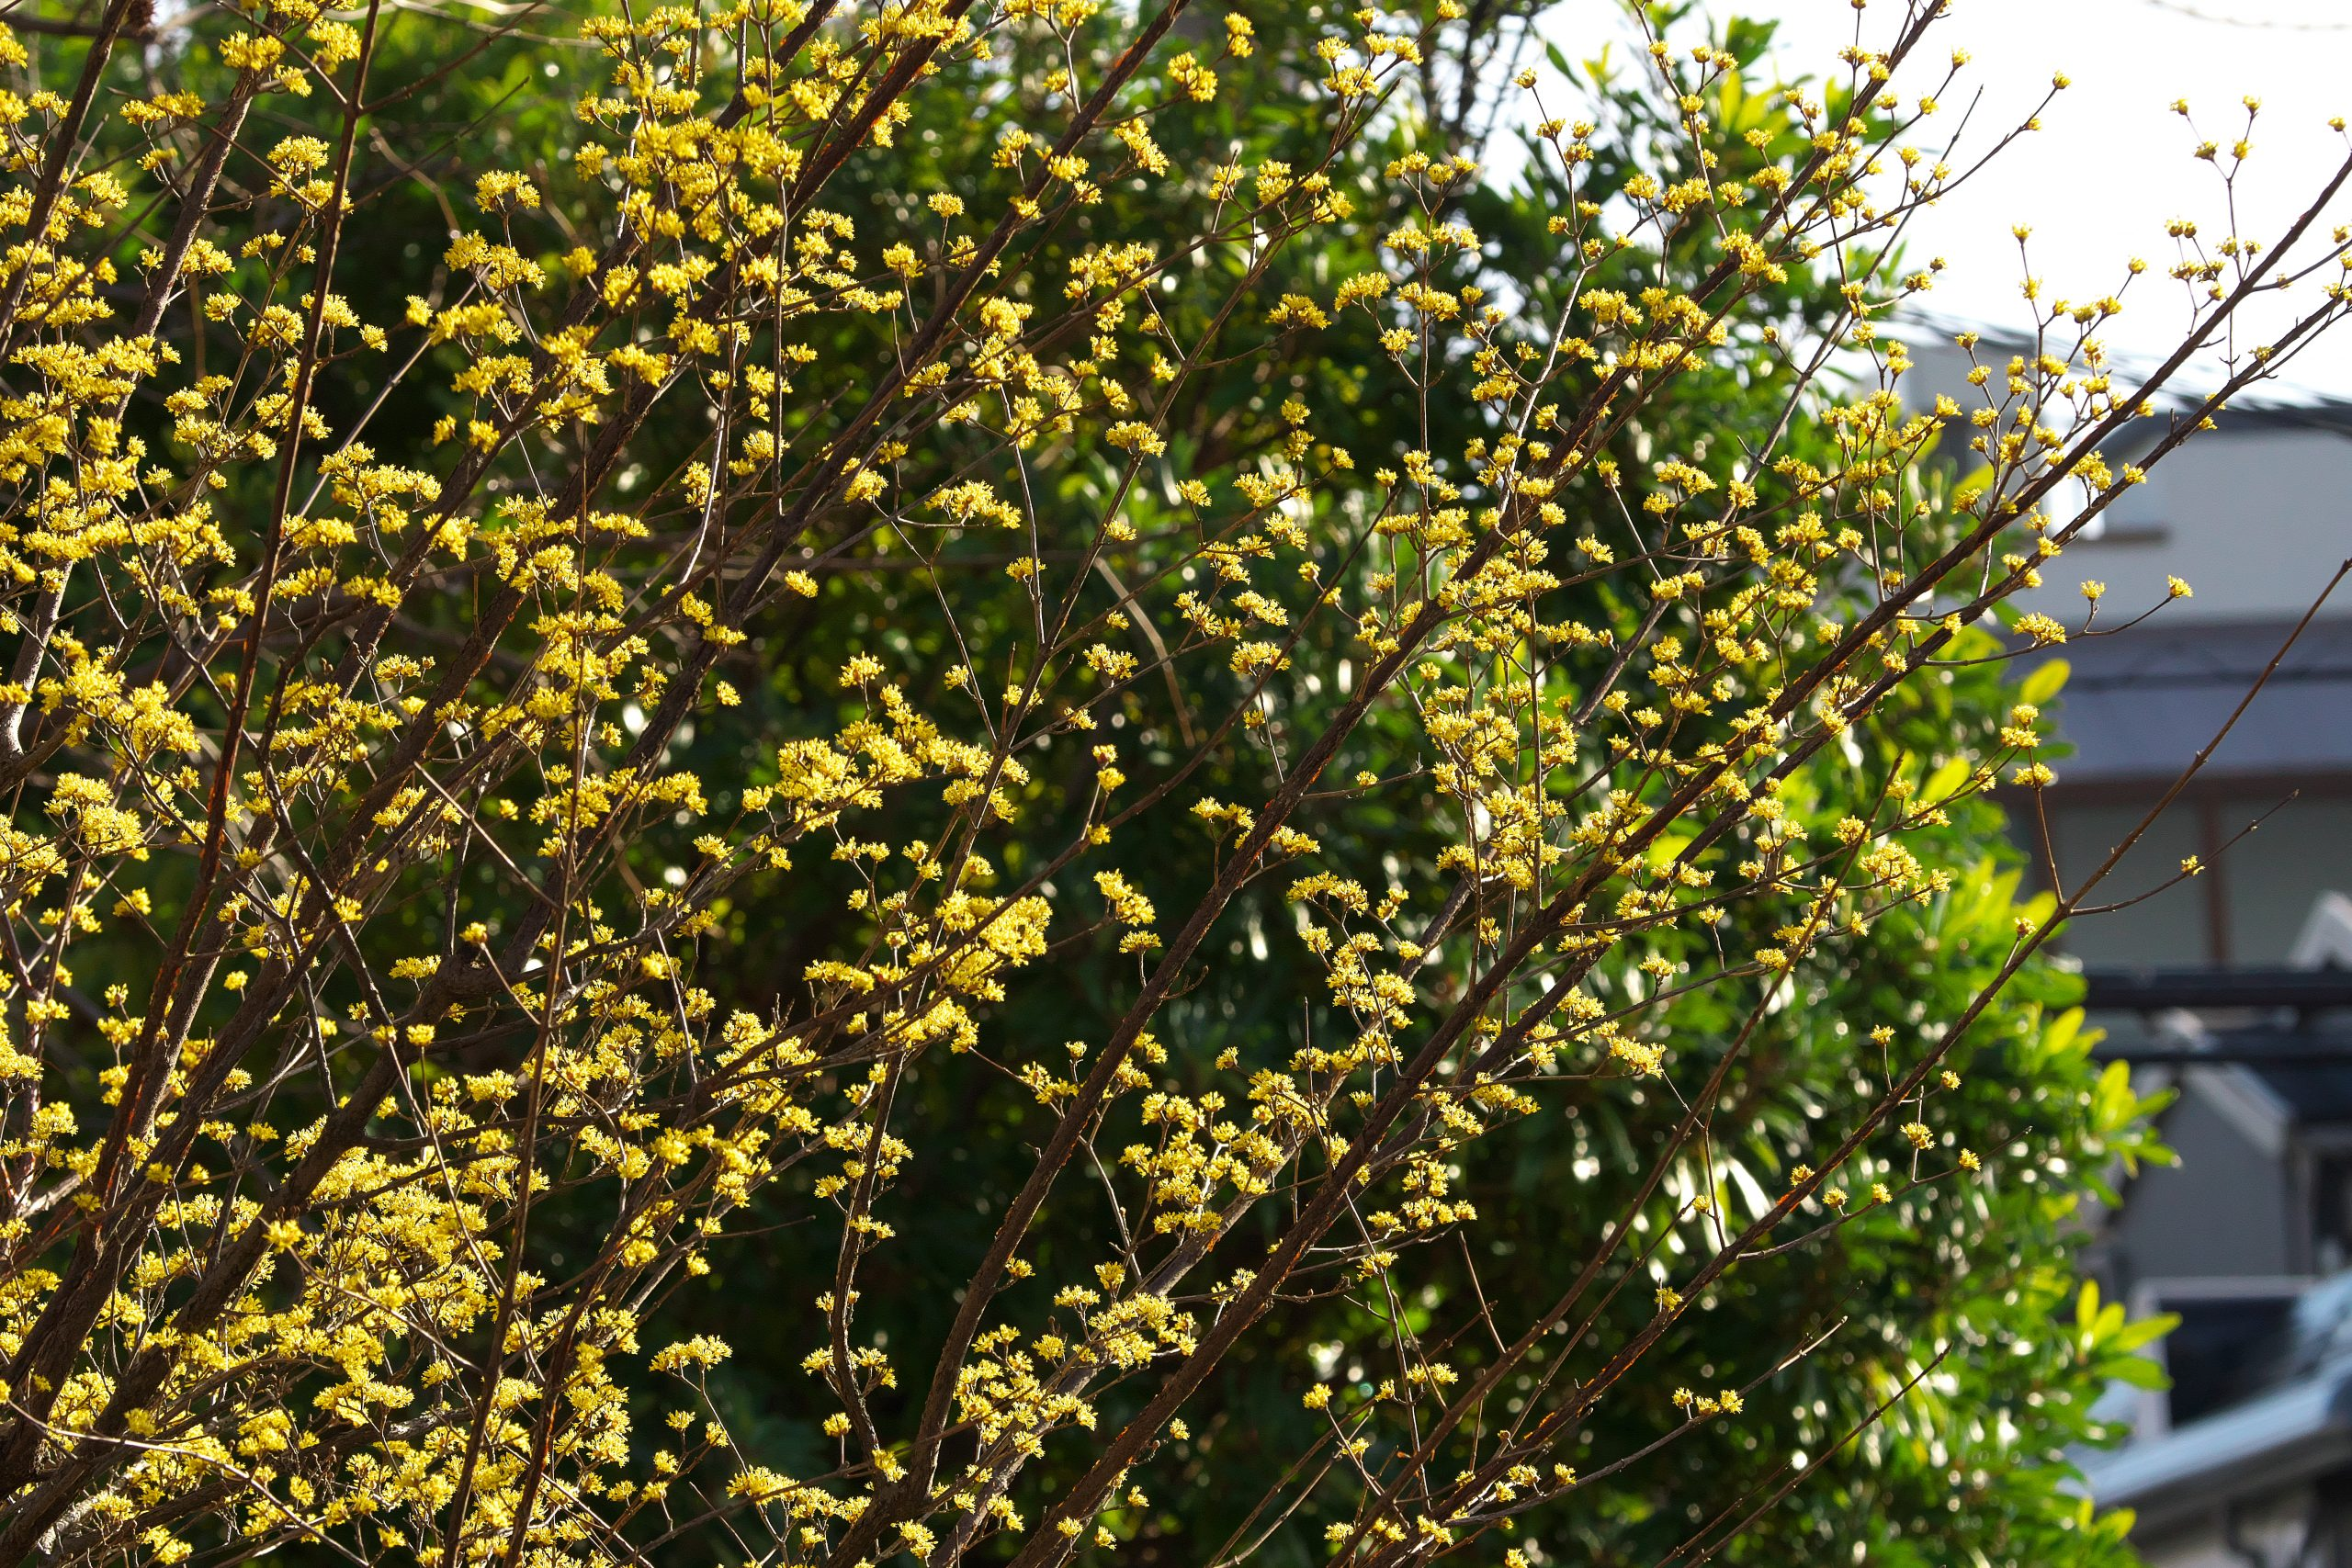 【SONY】この季節に咲く花(21)